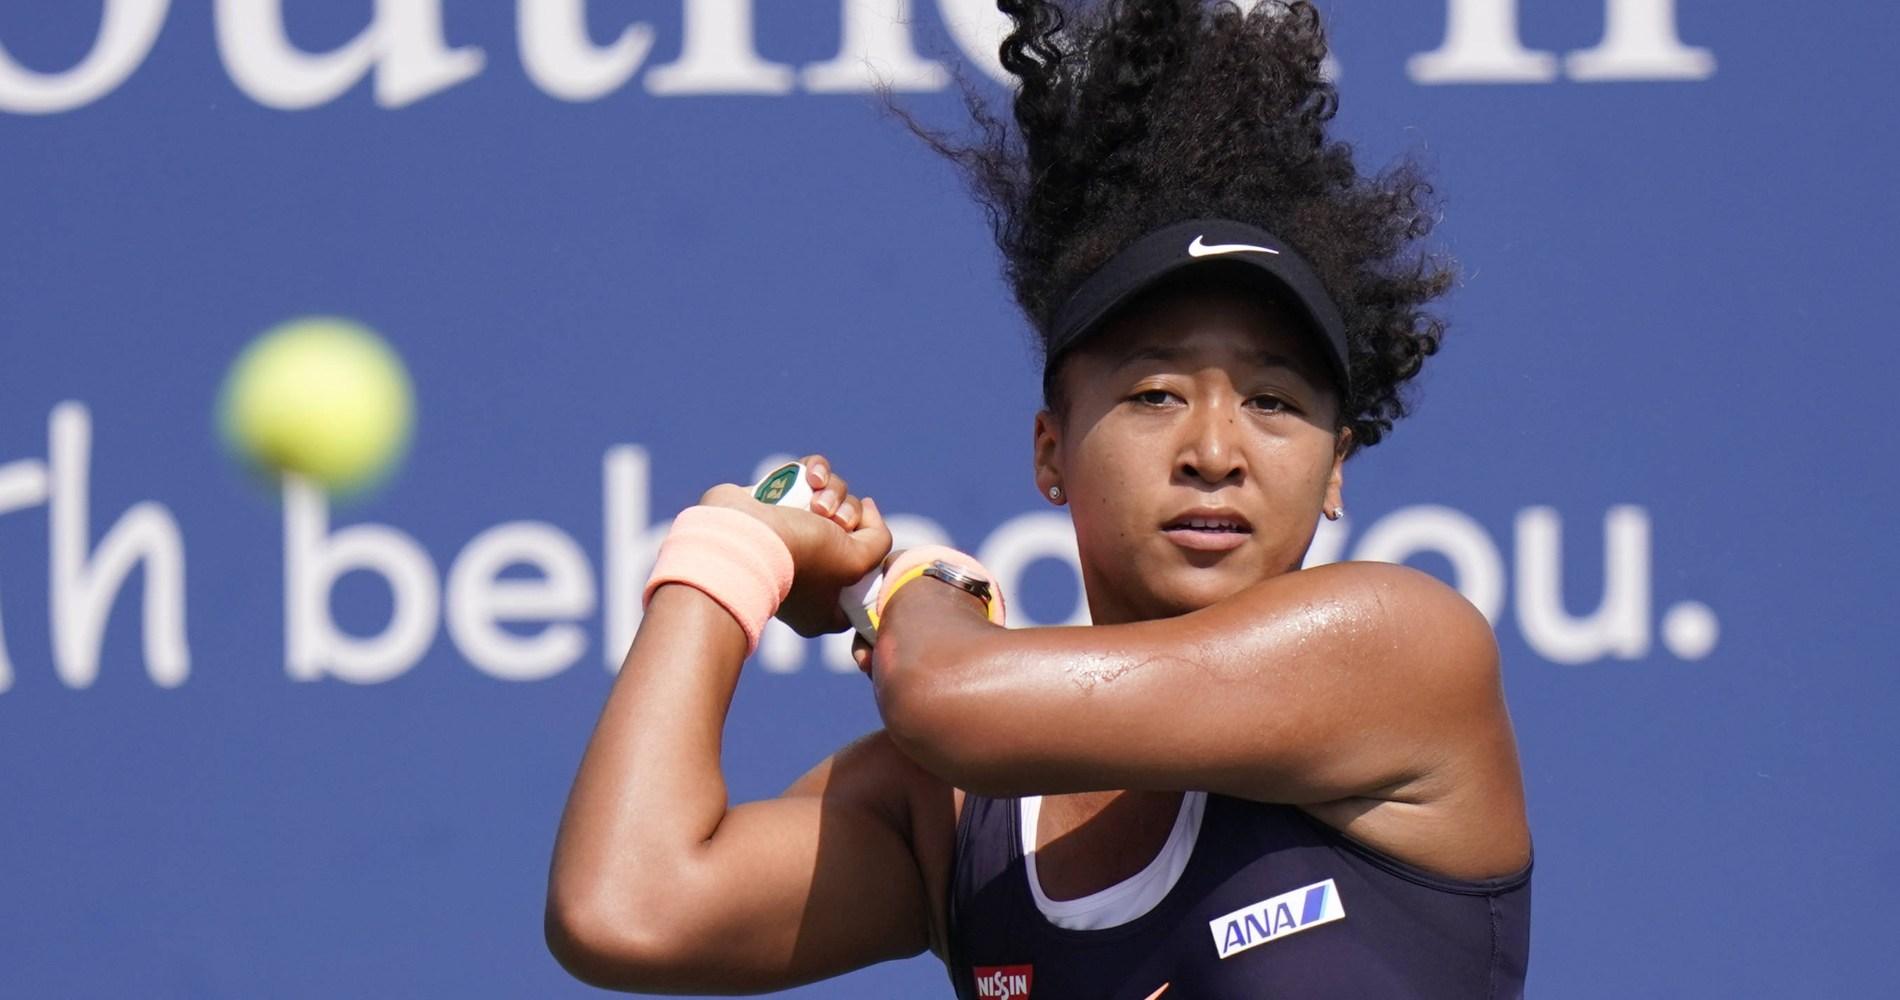 Naomi Osaka, Western & Southern Open (New York / Flushing Meadows), 2020